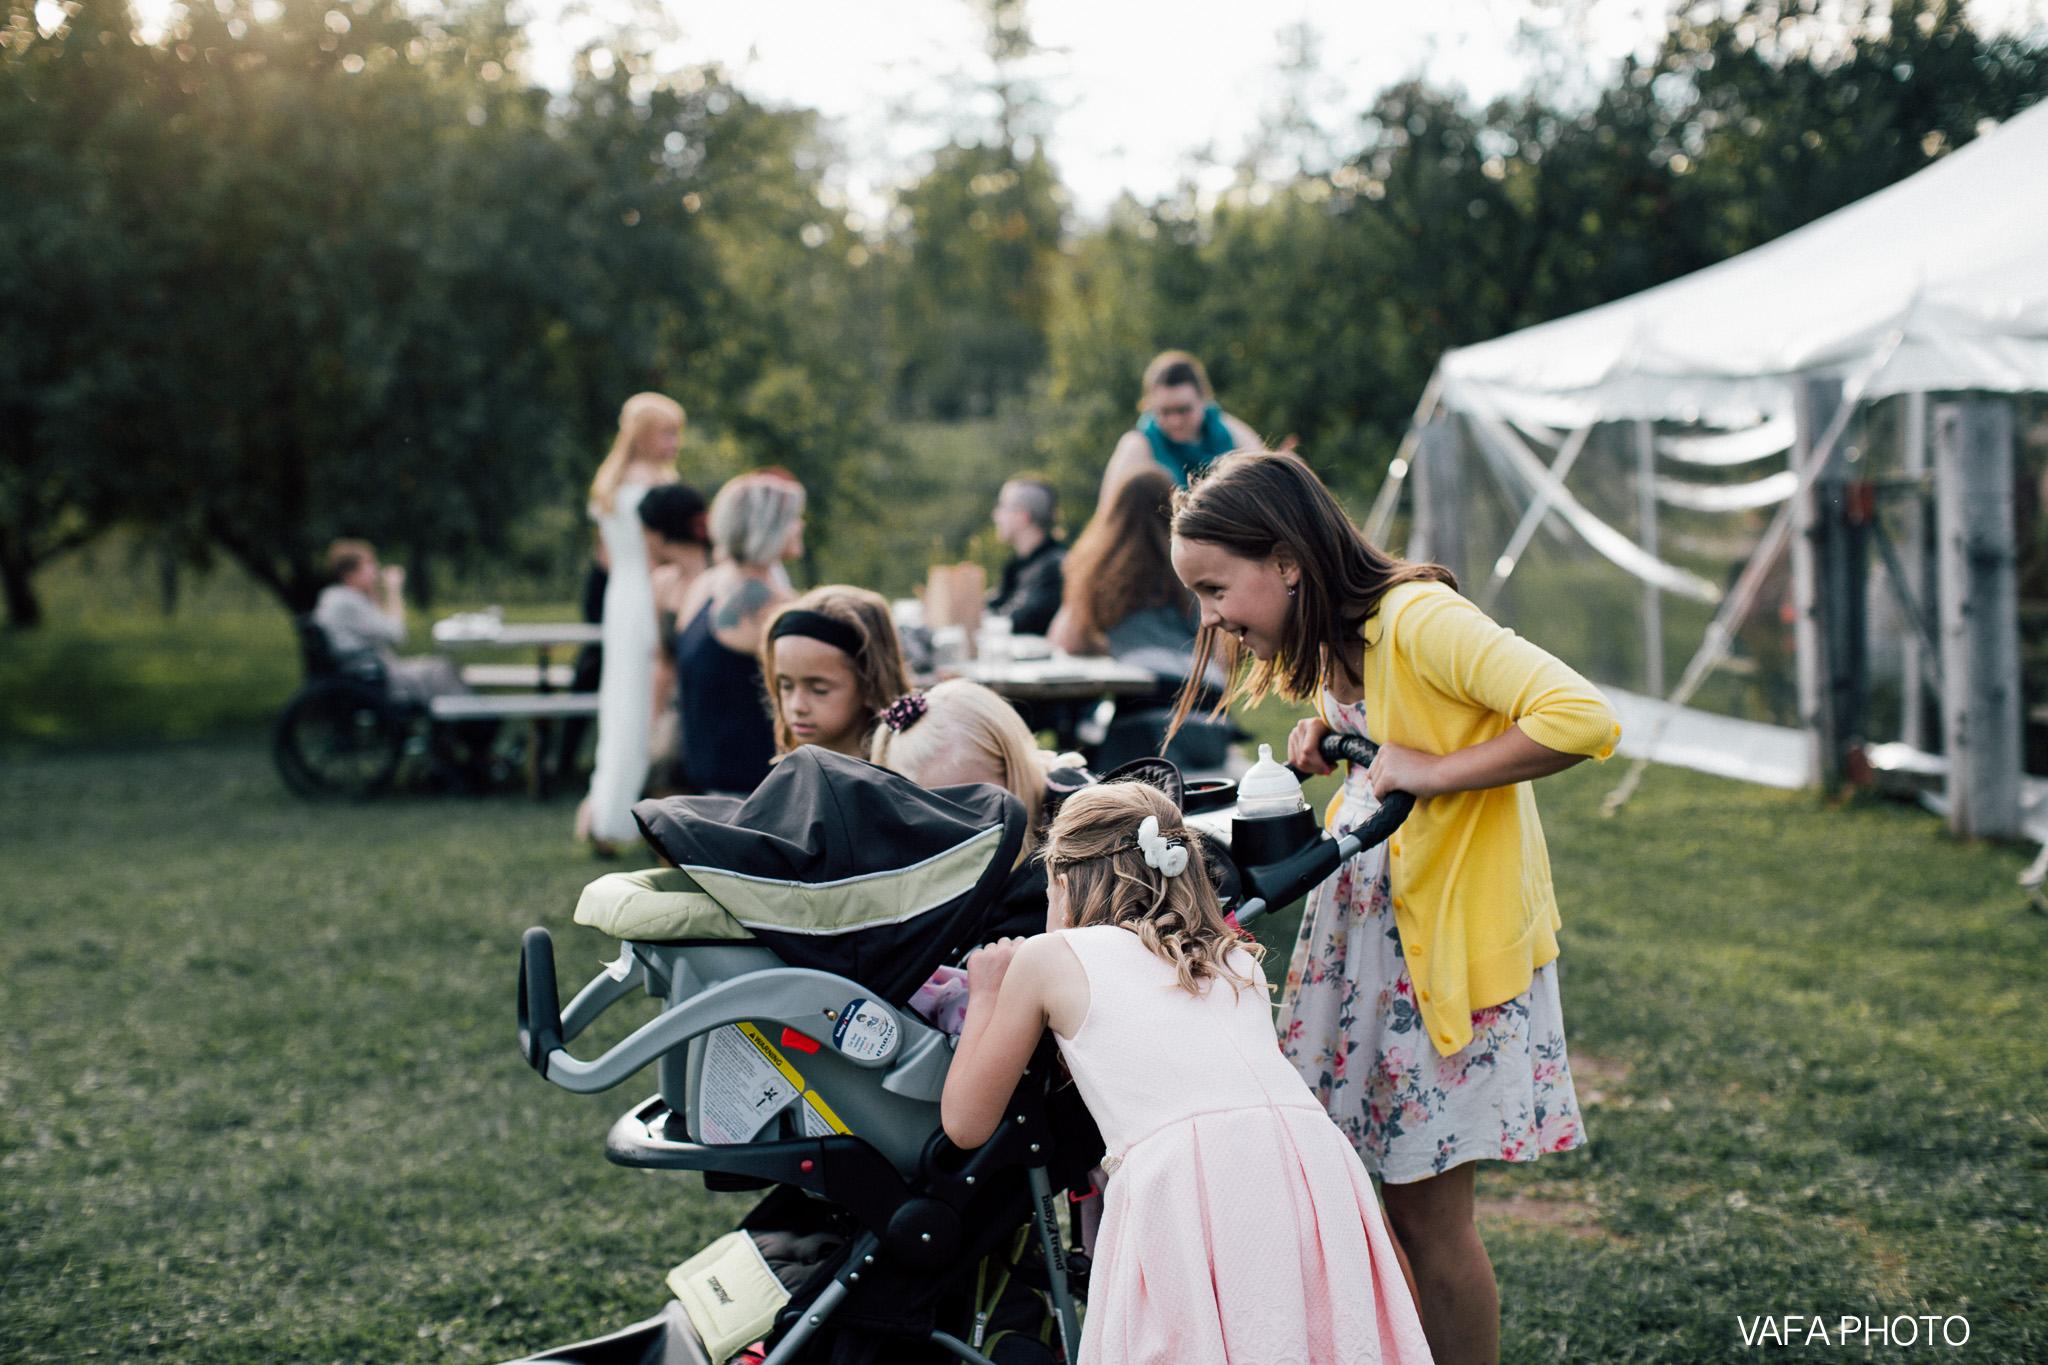 Belsolda-Farm-Wedding-Christy-Eric-Vafa-Photo-632.jpg